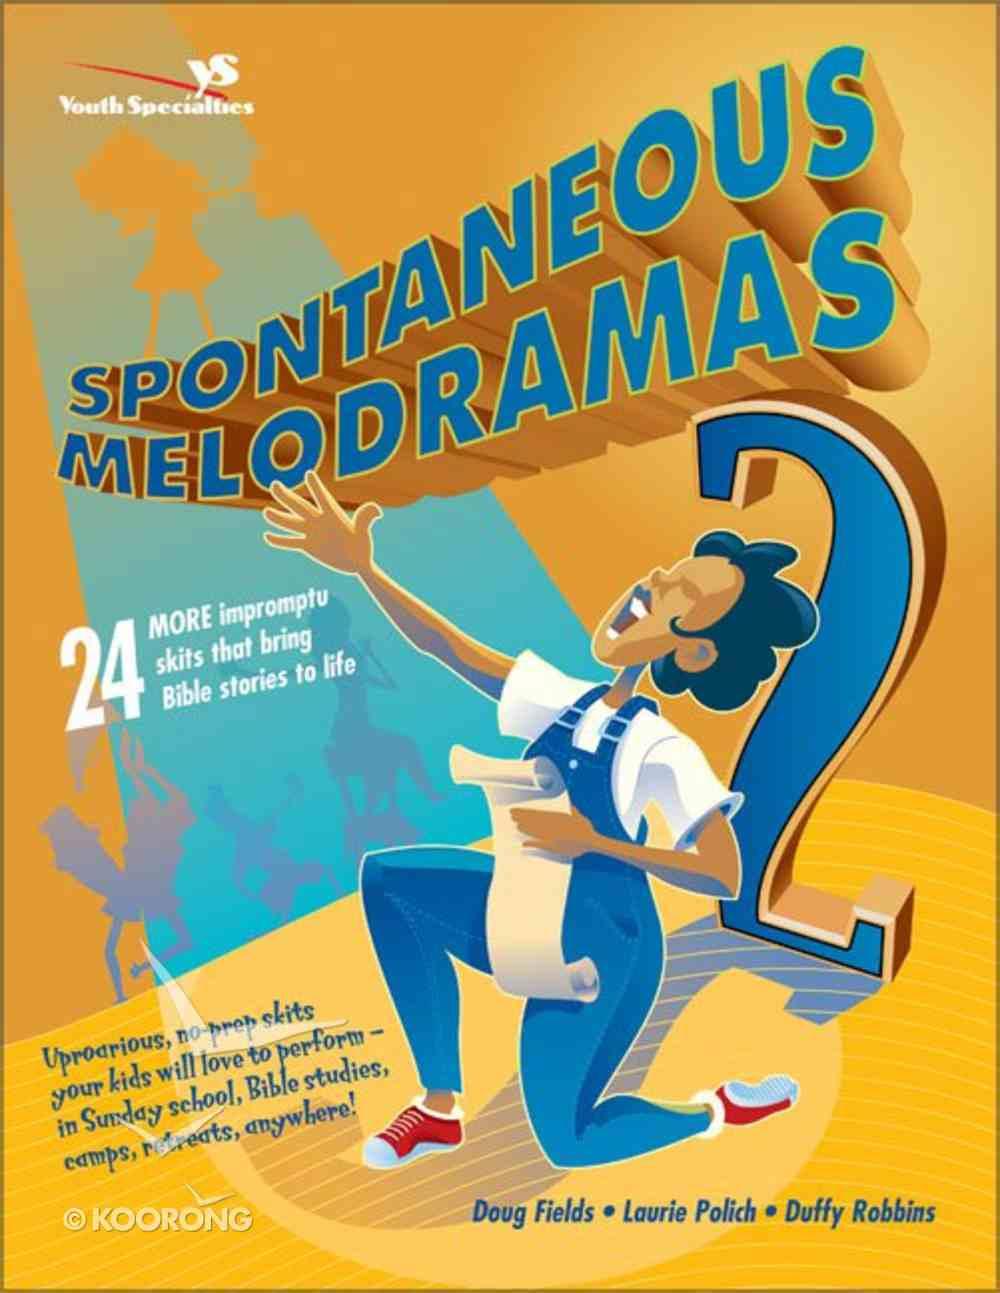 Spontaneous Melodramas 2 Paperback